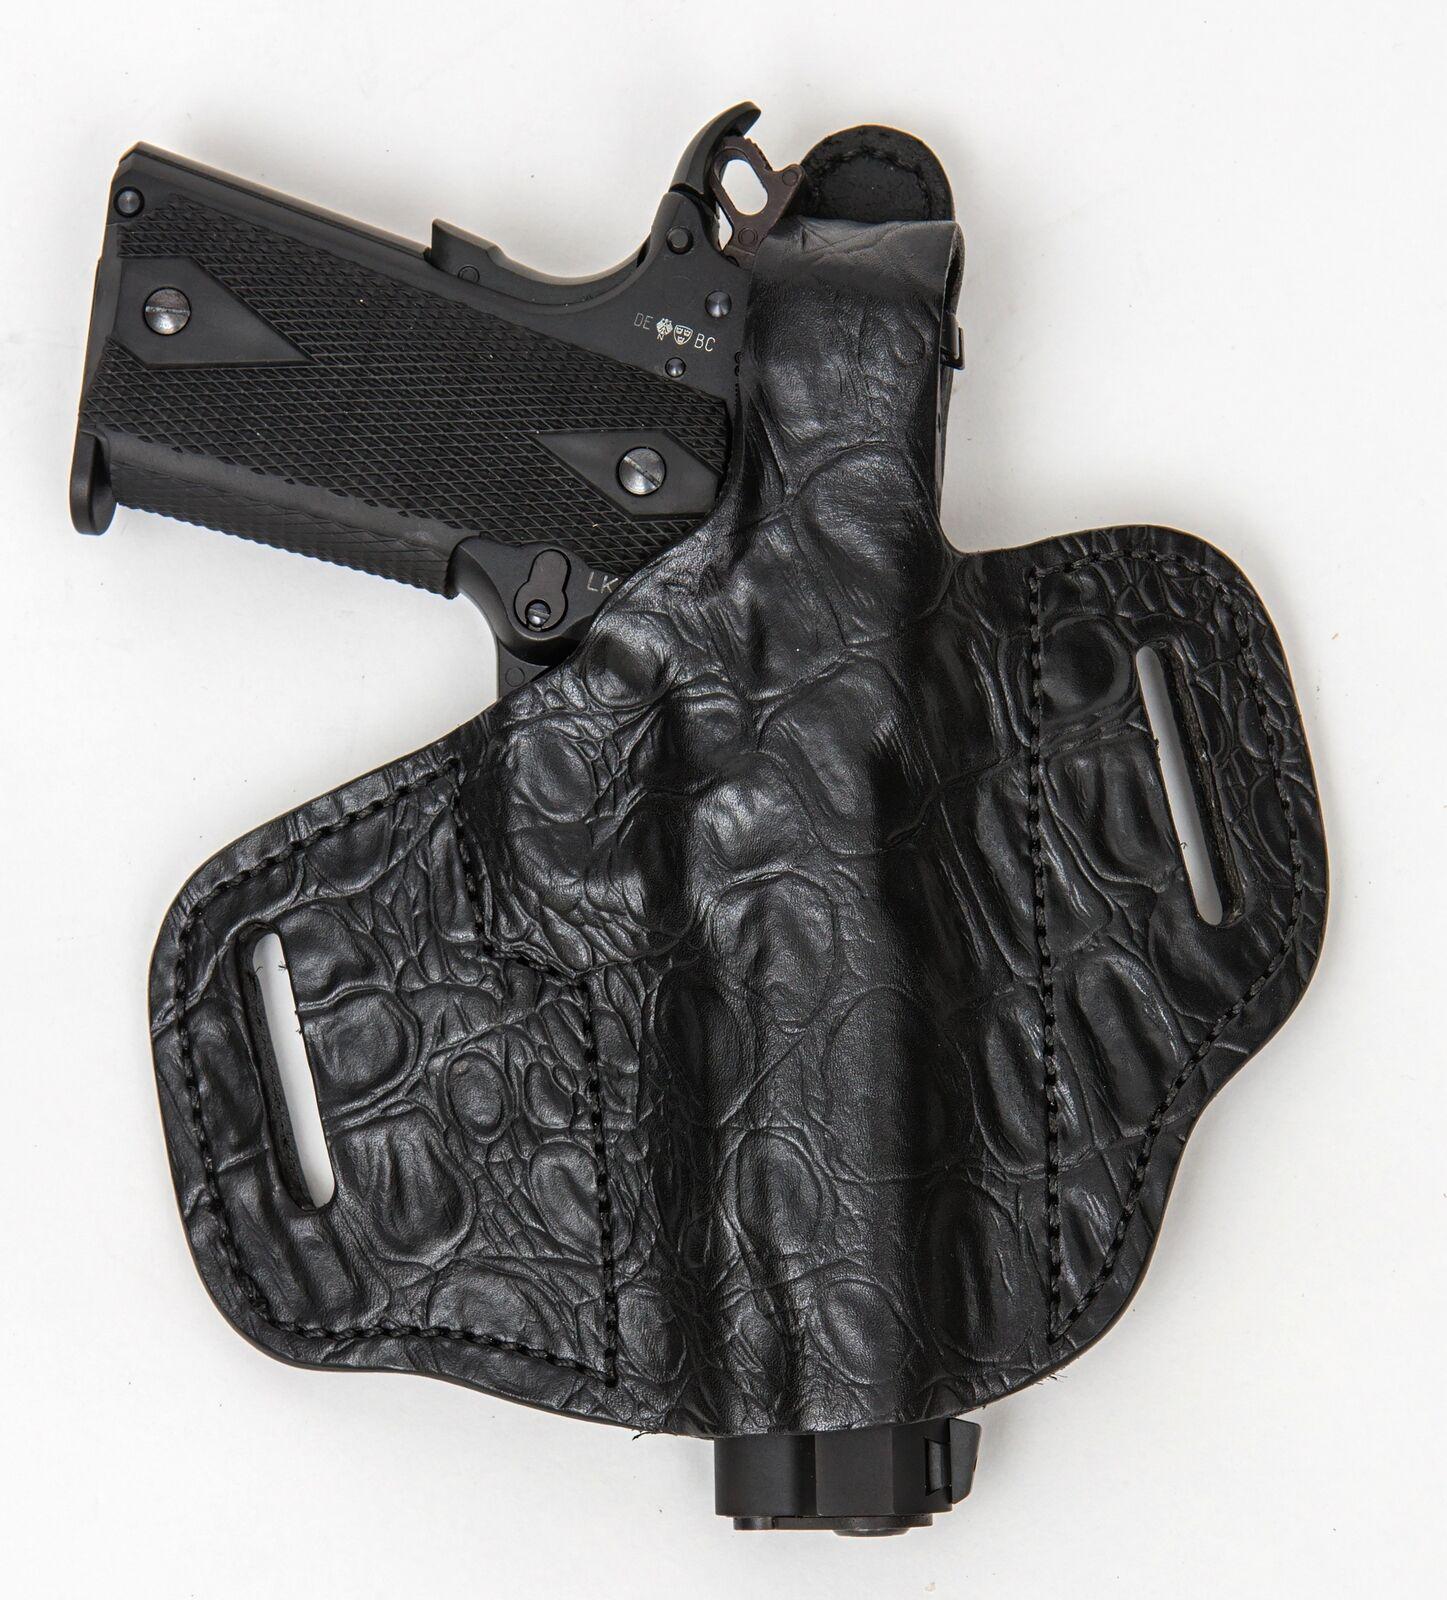 On Duty Conceal RH LH OWB Leder Gun Holster For Taurus PT111 140 145